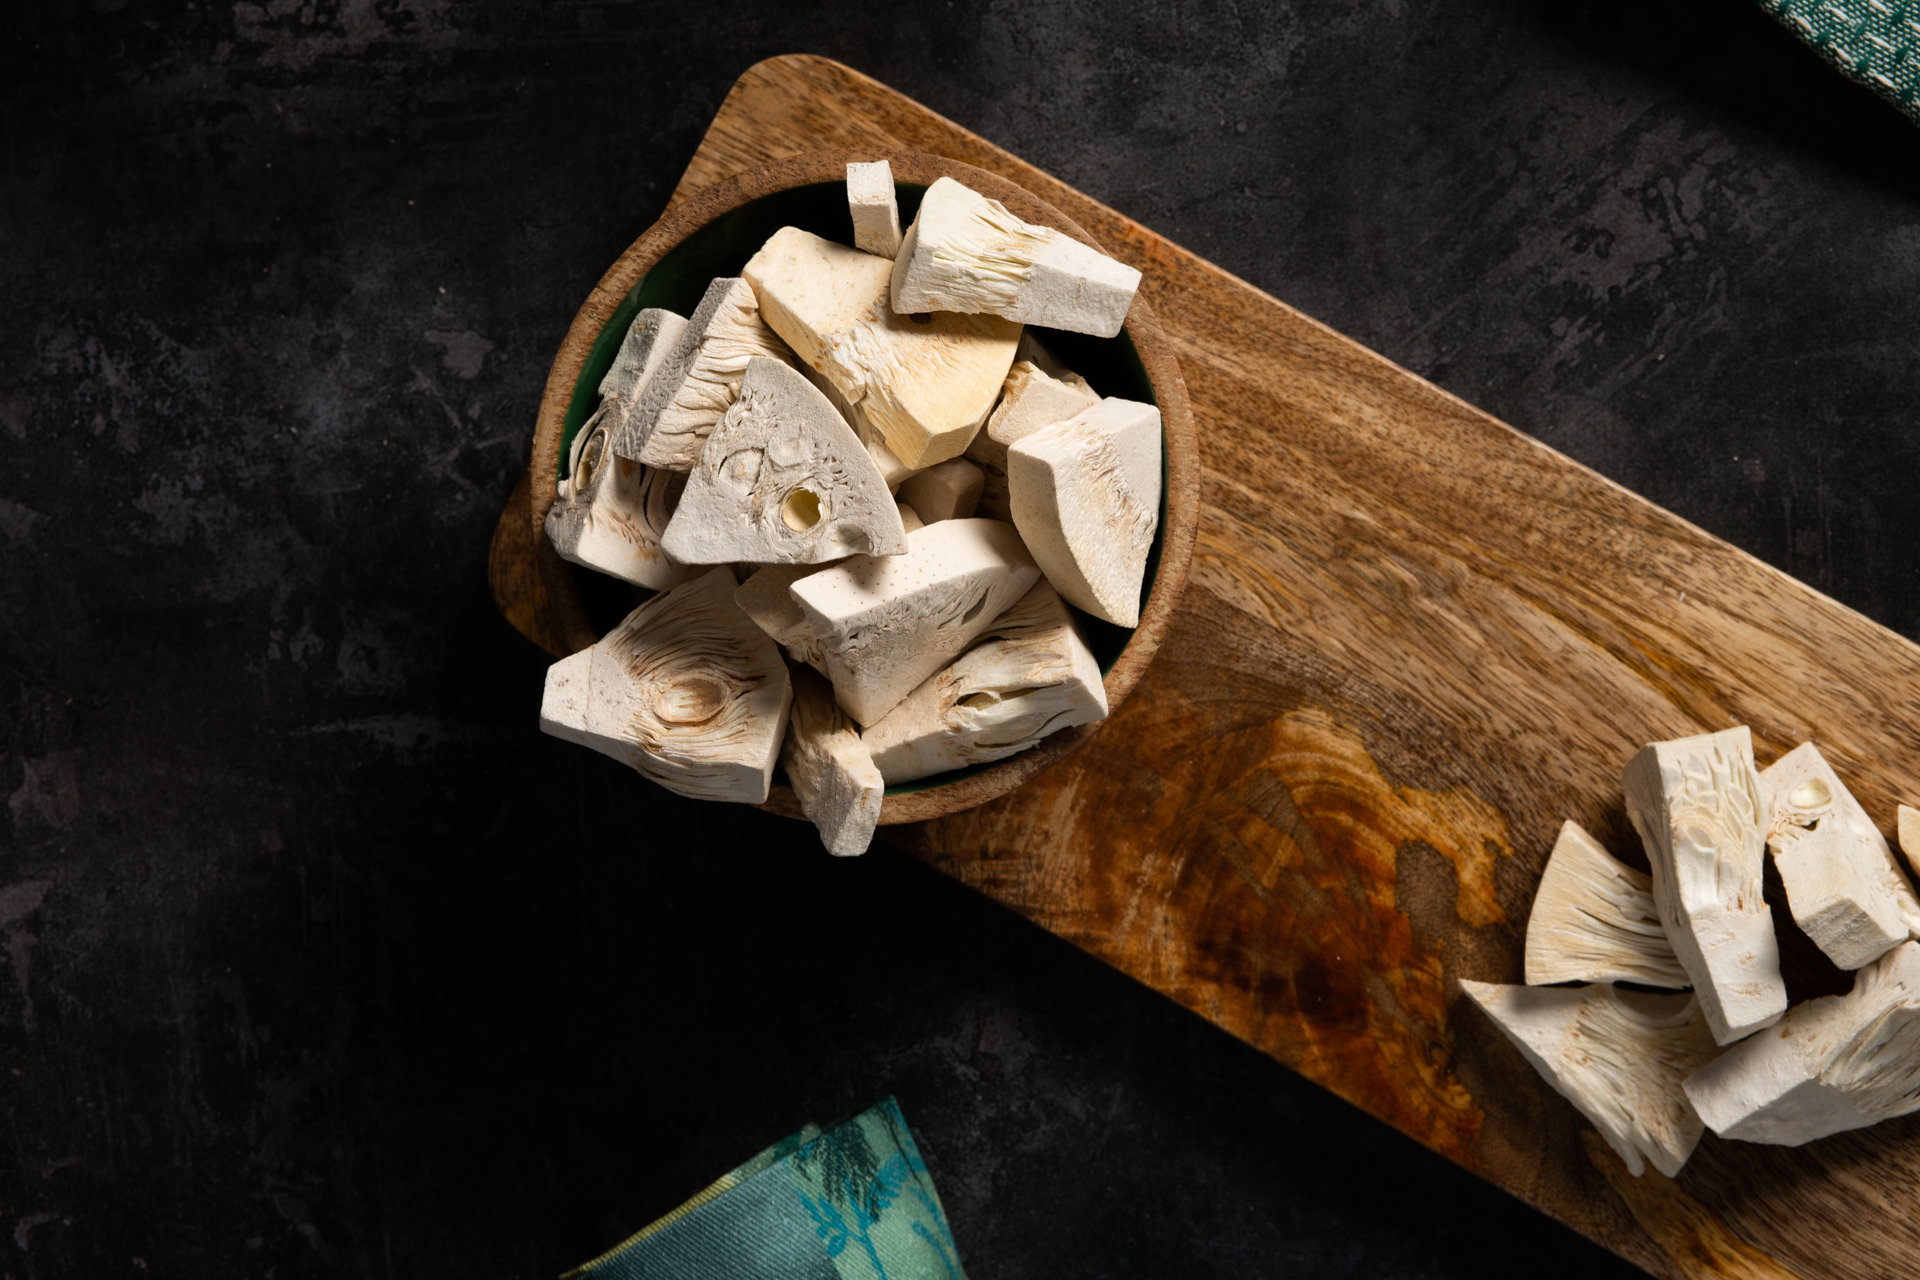 Freeze dried jackfruit offers vegan versatility